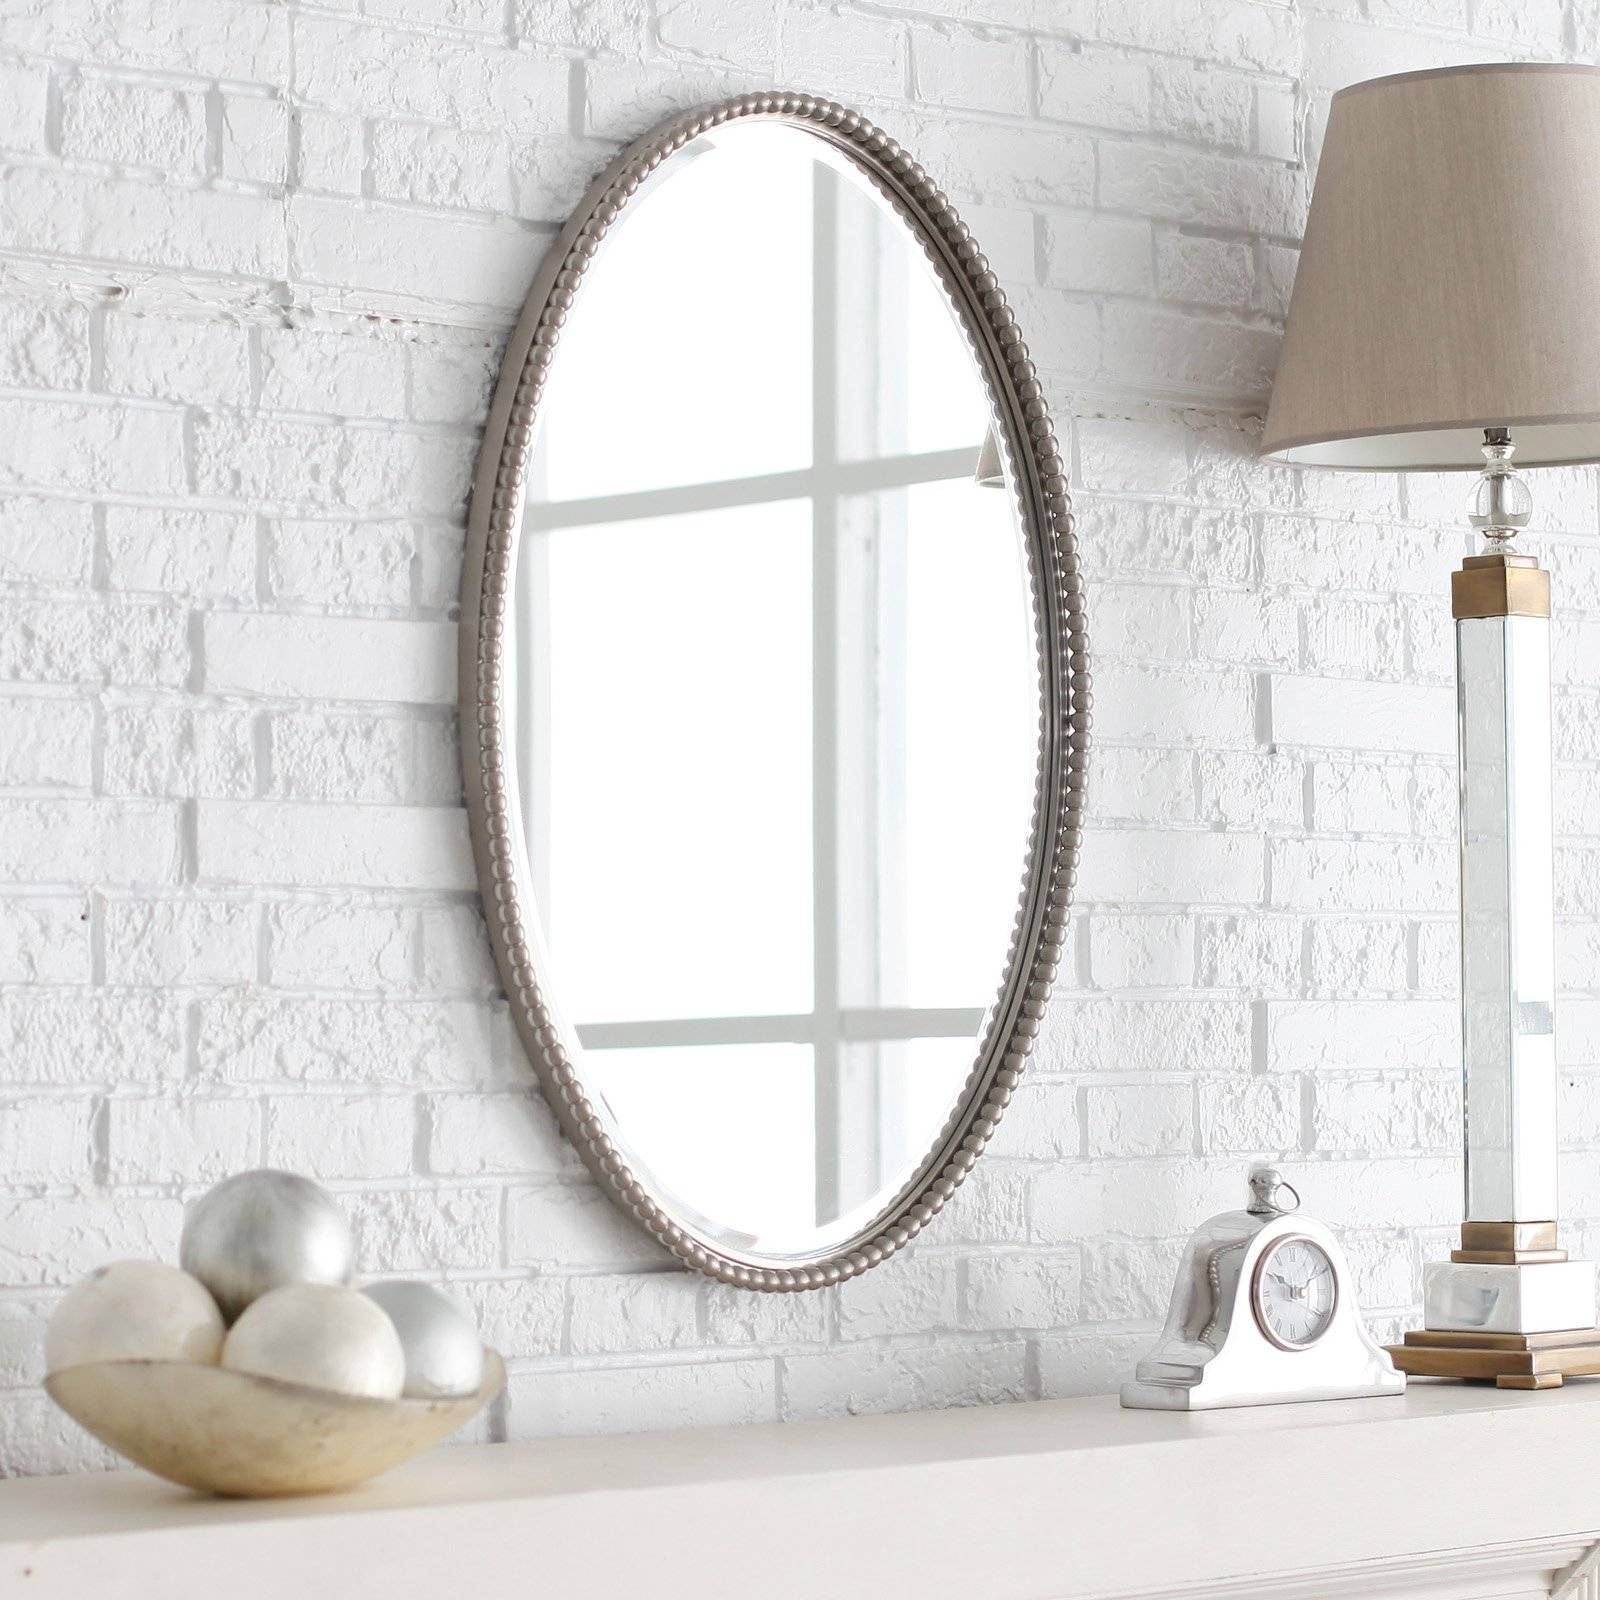 Uttermost Frameless Oval Beveled Vanity Mirror | Hayneedle regarding White Oval Mirrors (Image 22 of 25)